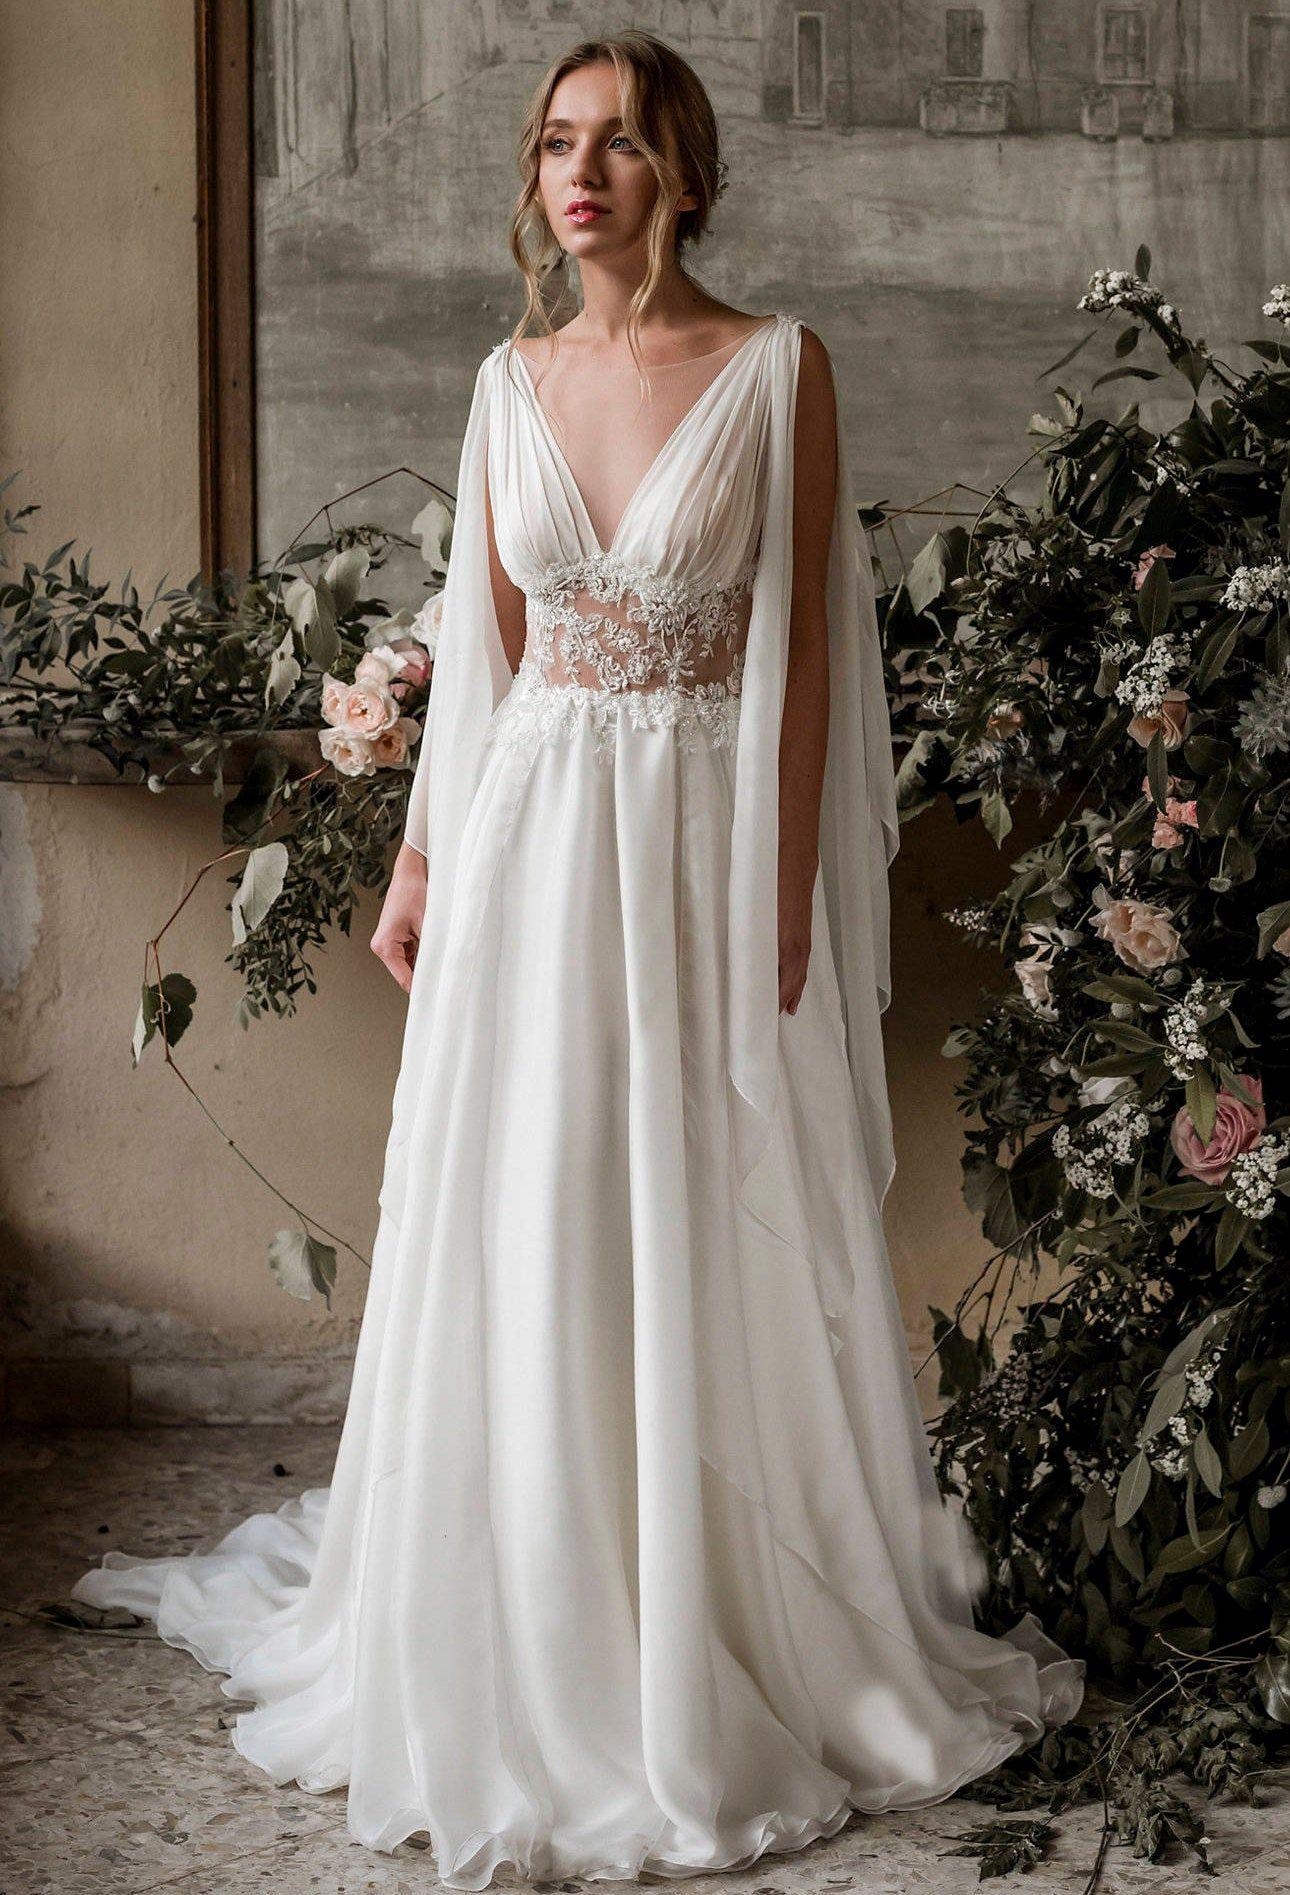 15 Scrumptious Wedding Dresses With Straps Ideas Grecian Wedding Dress Grecian Wedding Bridal Gown Bohemian [ 1895 x 1290 Pixel ]